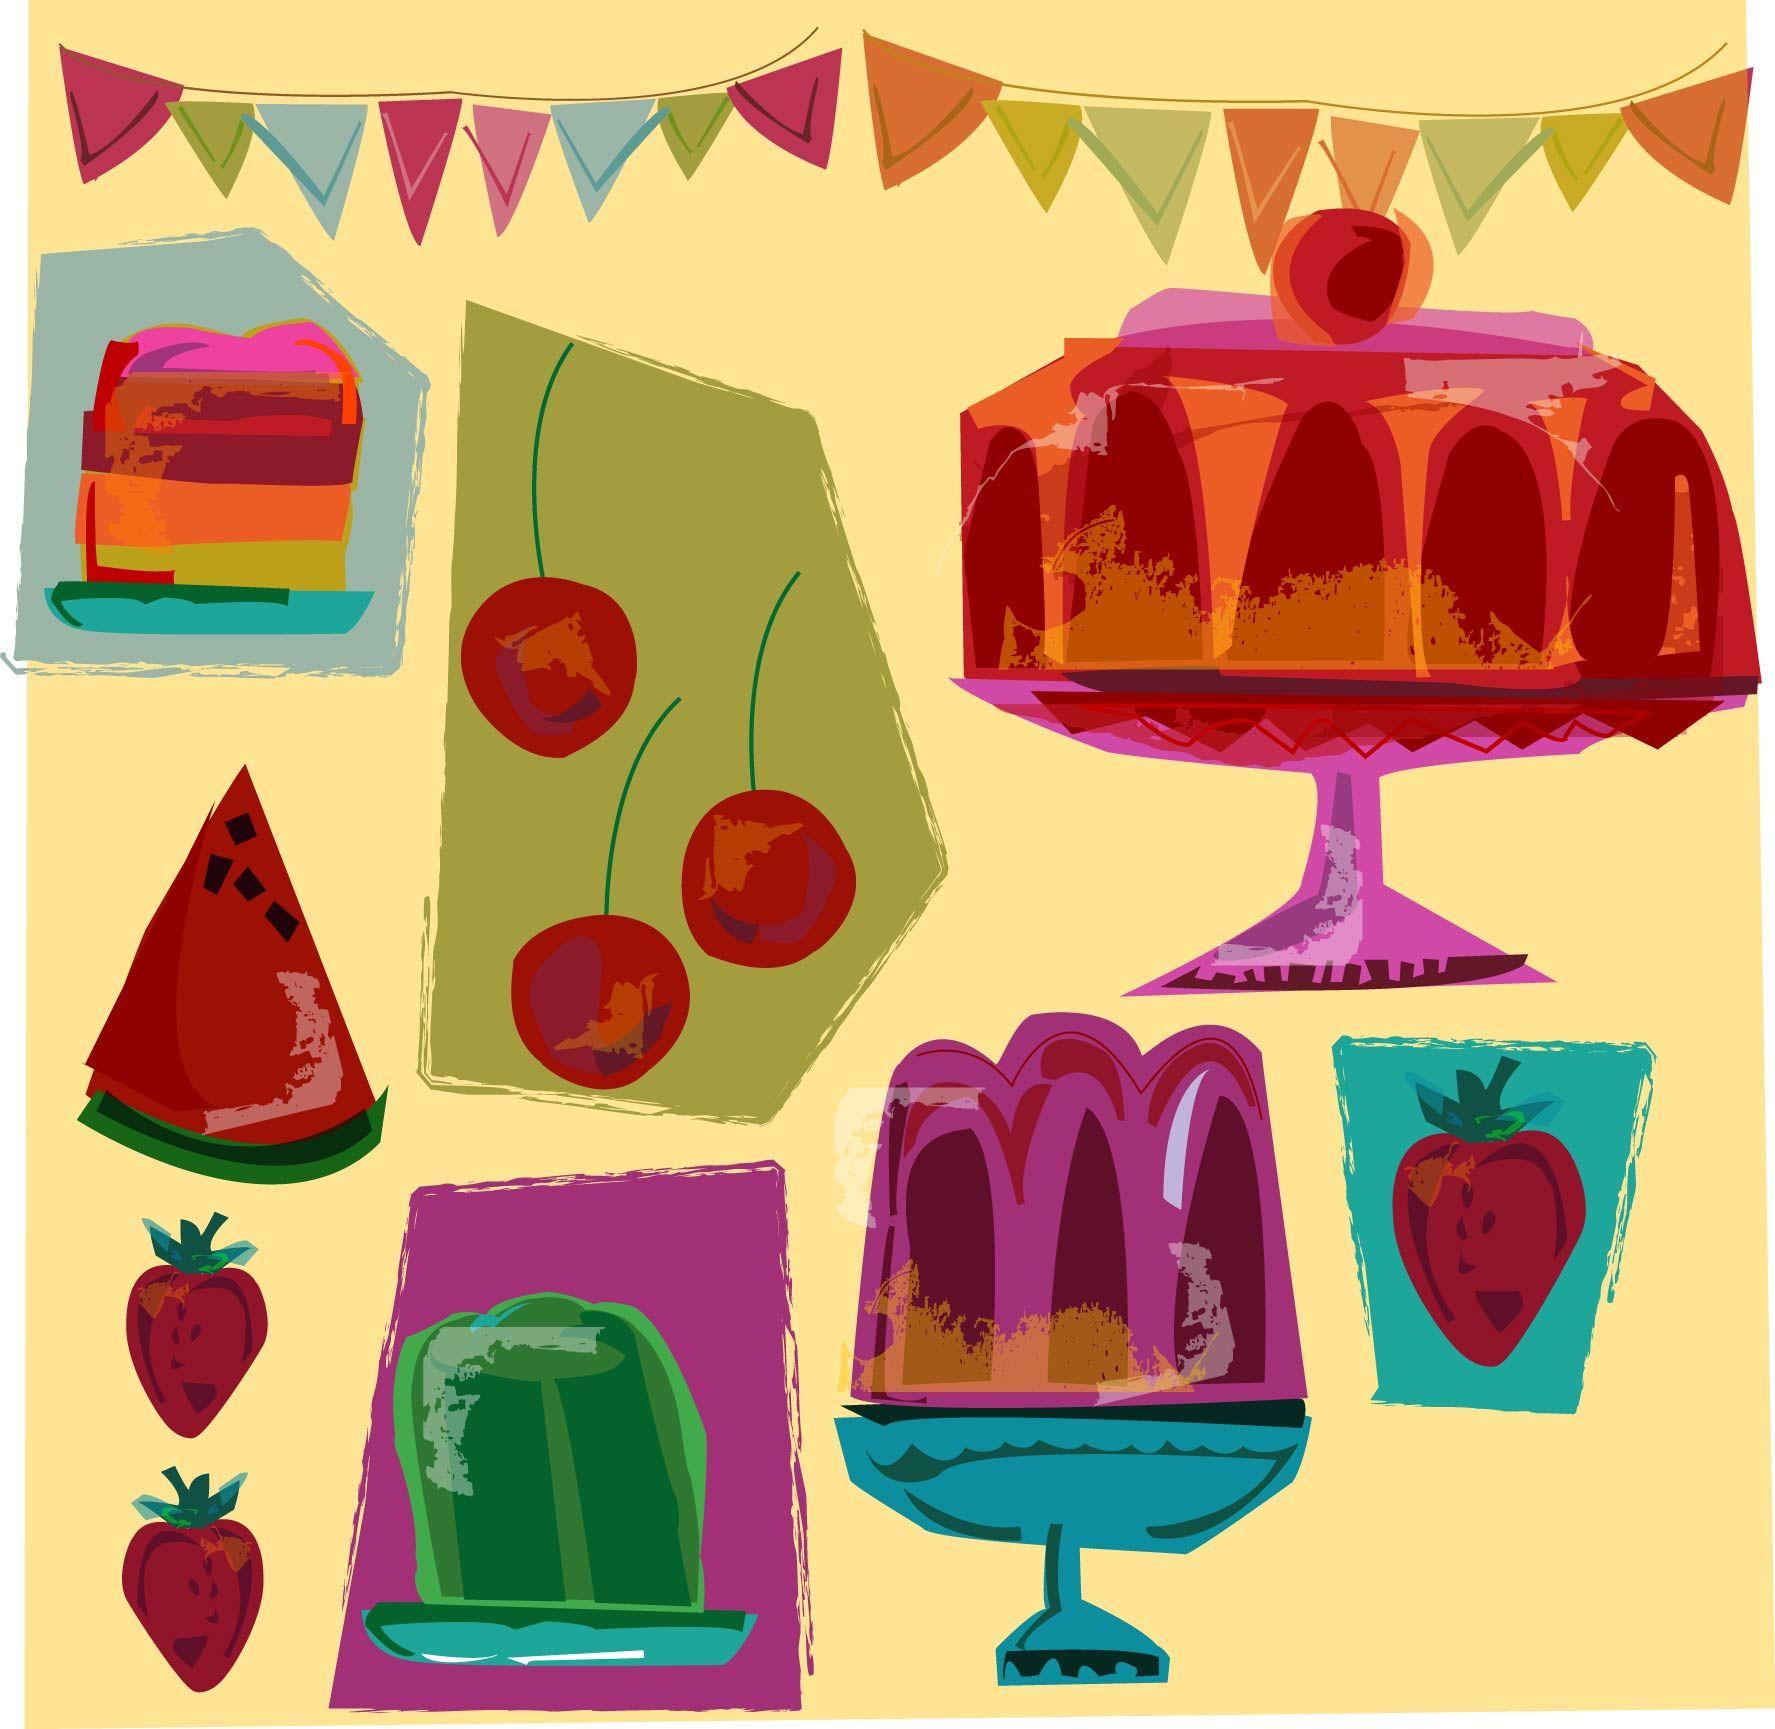 Jelly print by Gaby Braun